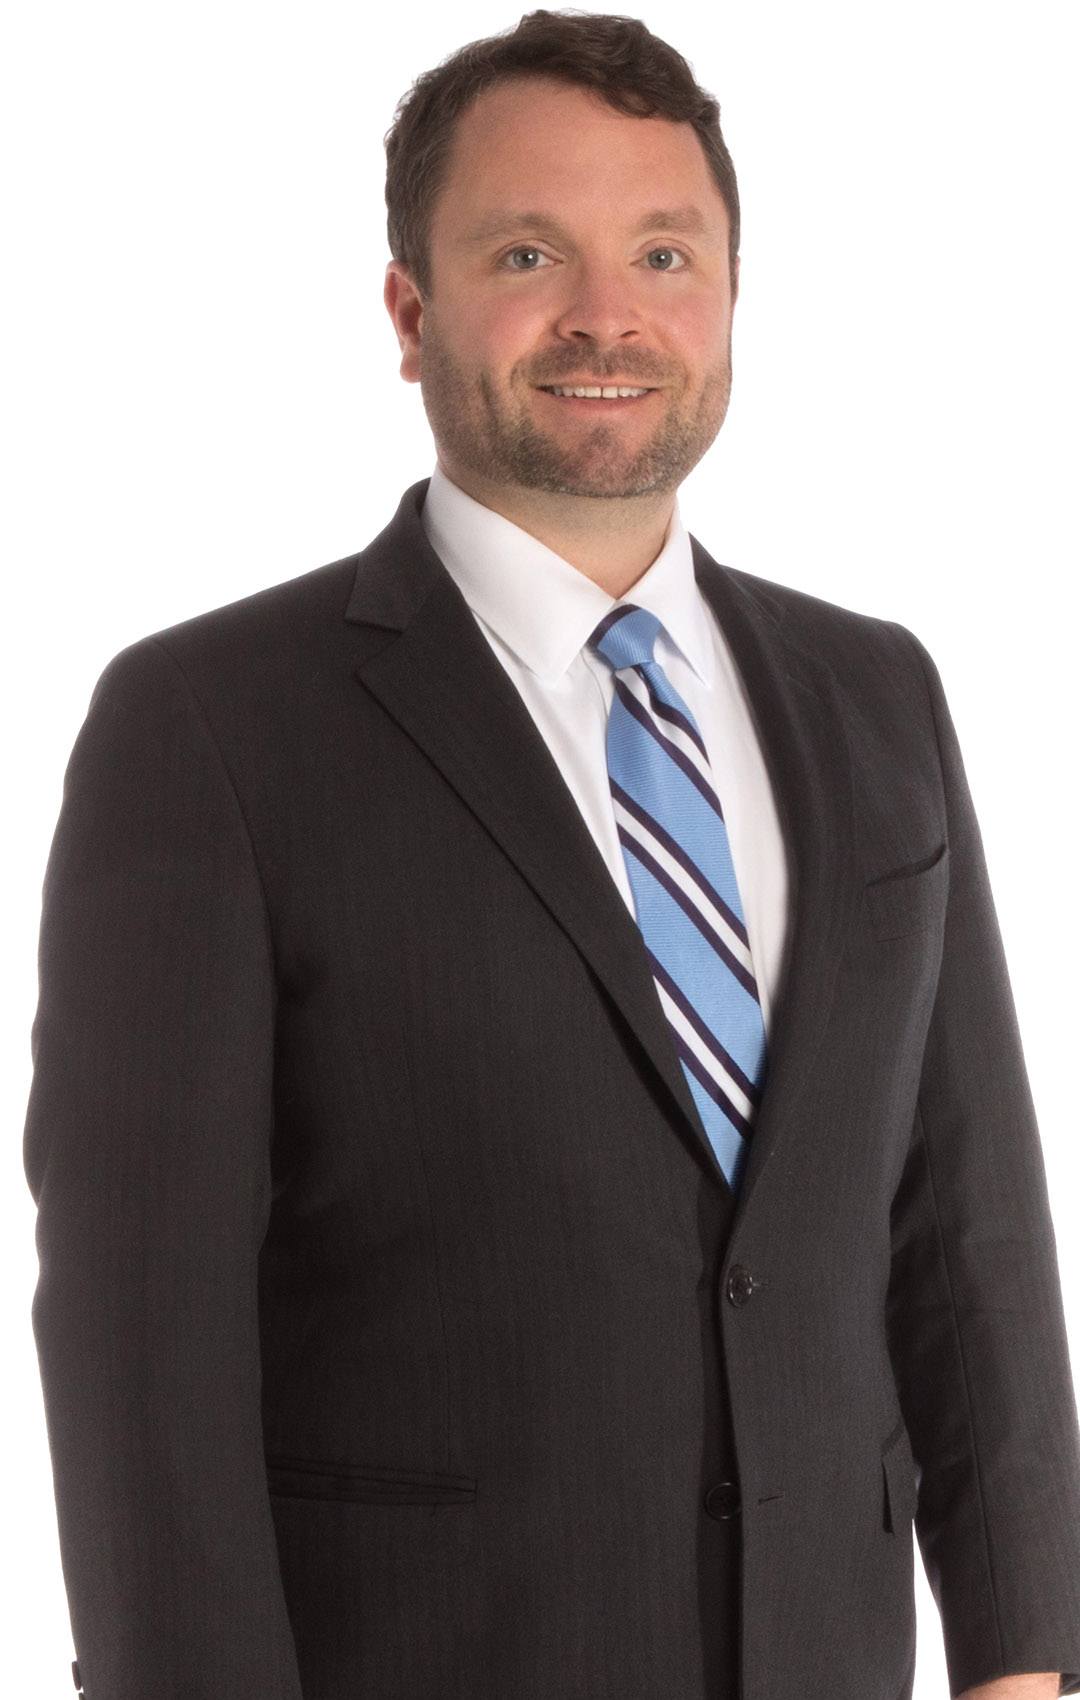 John E. Branch III